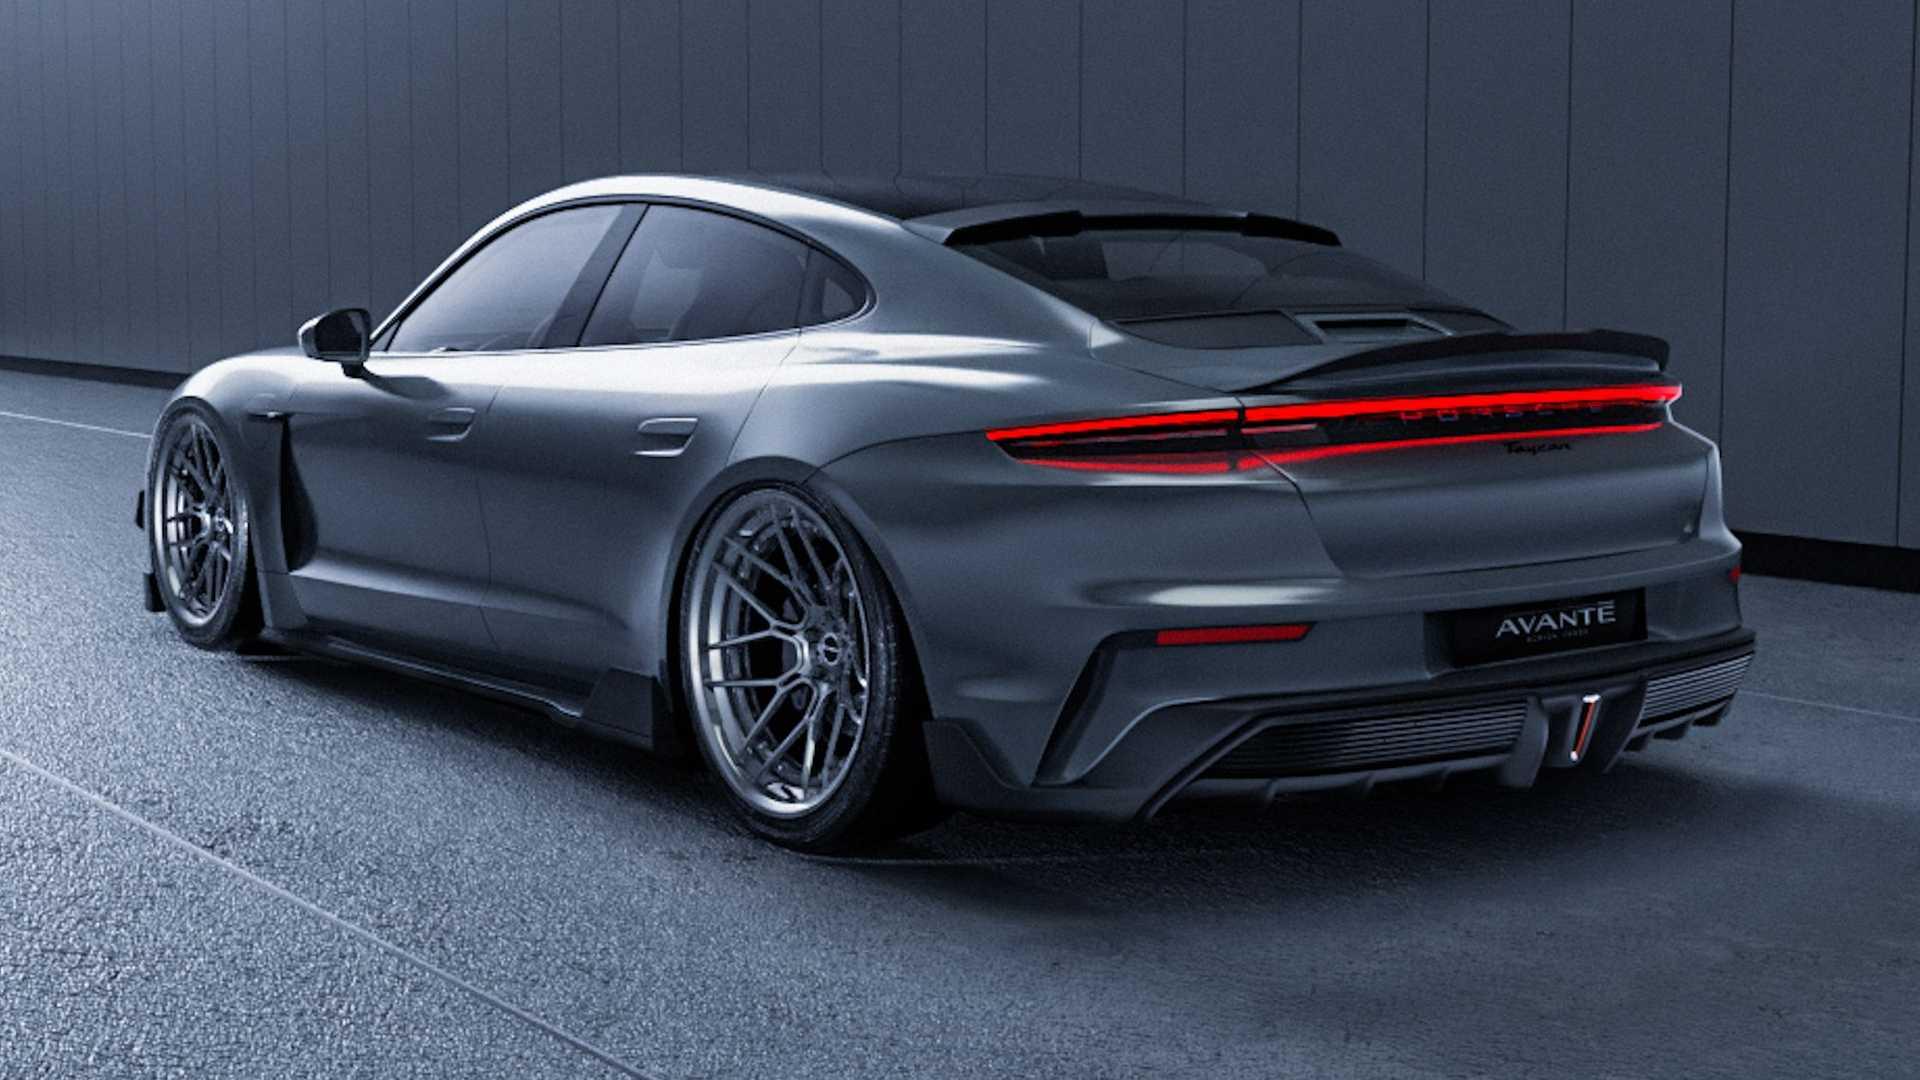 Porsche-Taycan-by-Avante-Design-16